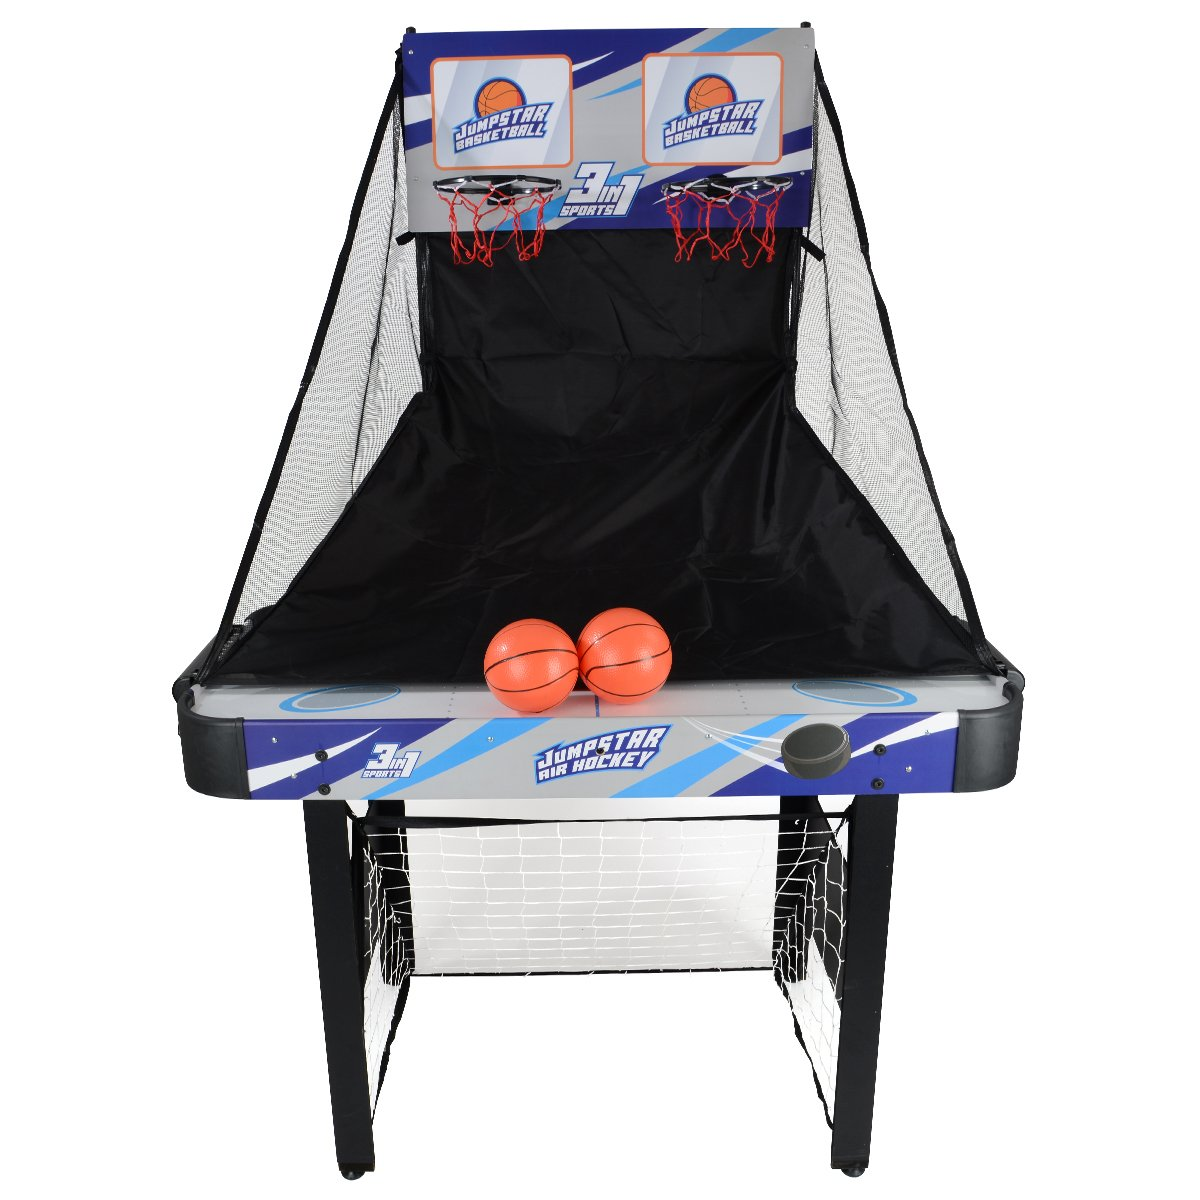 JumpStar 3-In-1 Multi Games Table Childrens Air Hockey Football Basketball 240V